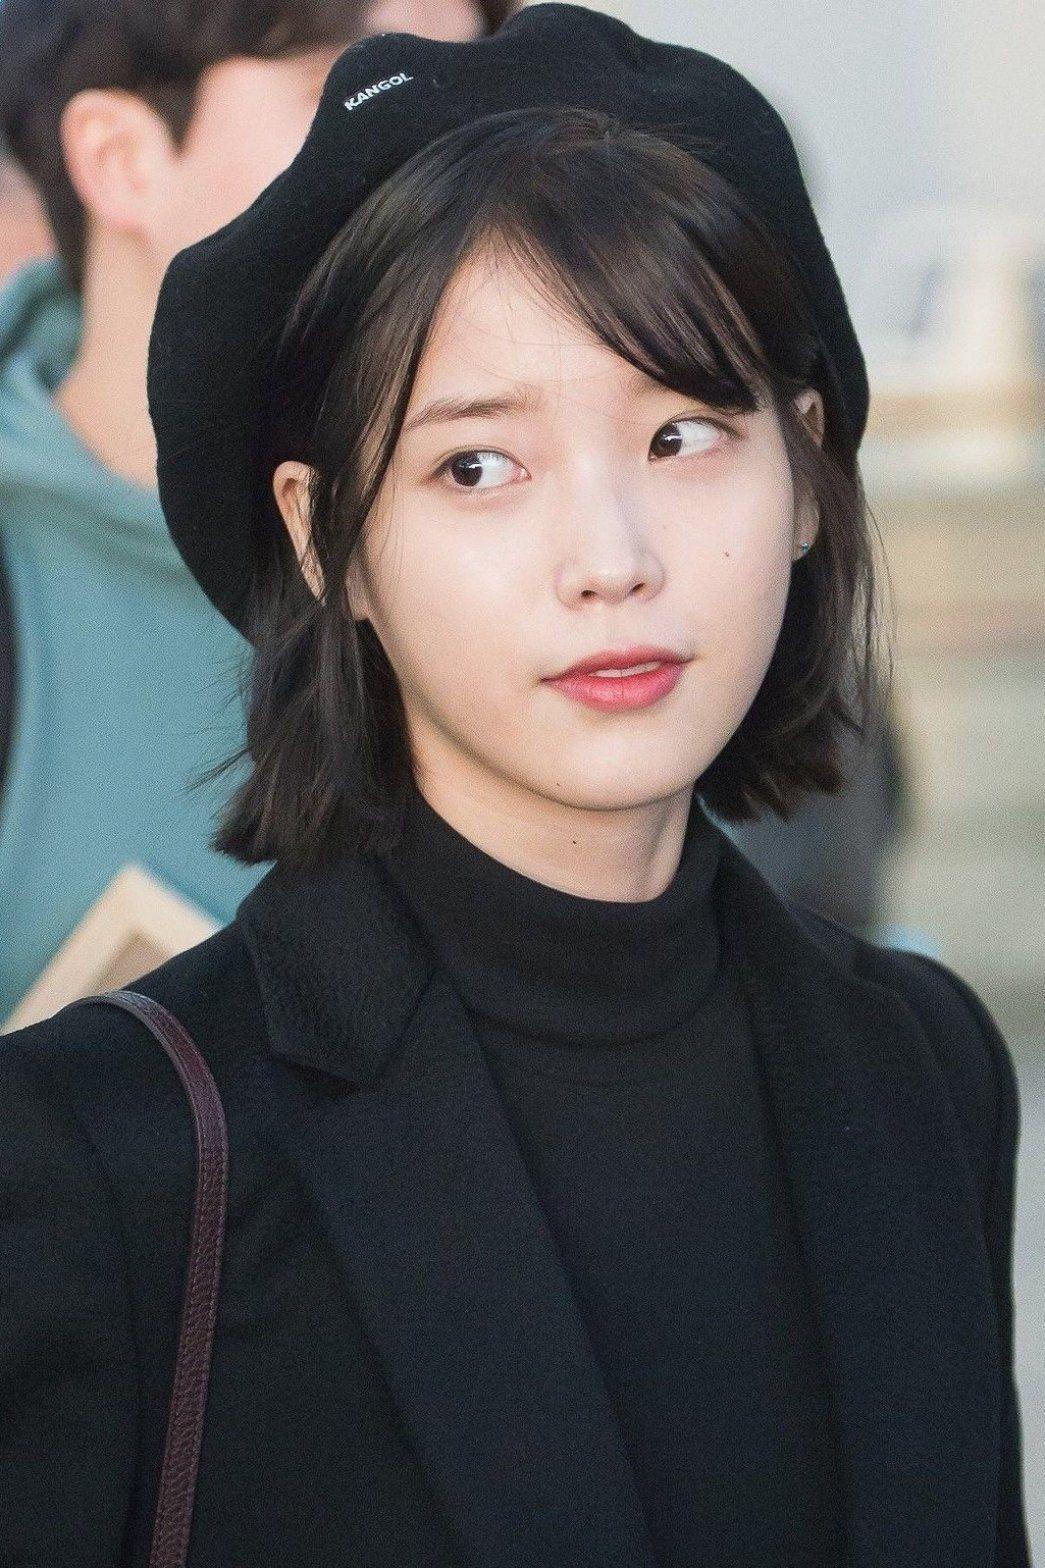 K Pop Hairstyles Idols Who Prove Short Hair Is Beautiful Kpop Haircut Trends Koreanhaircut Bestkpophaircu Short Hair Styles Short Hair With Bangs Hair Styles